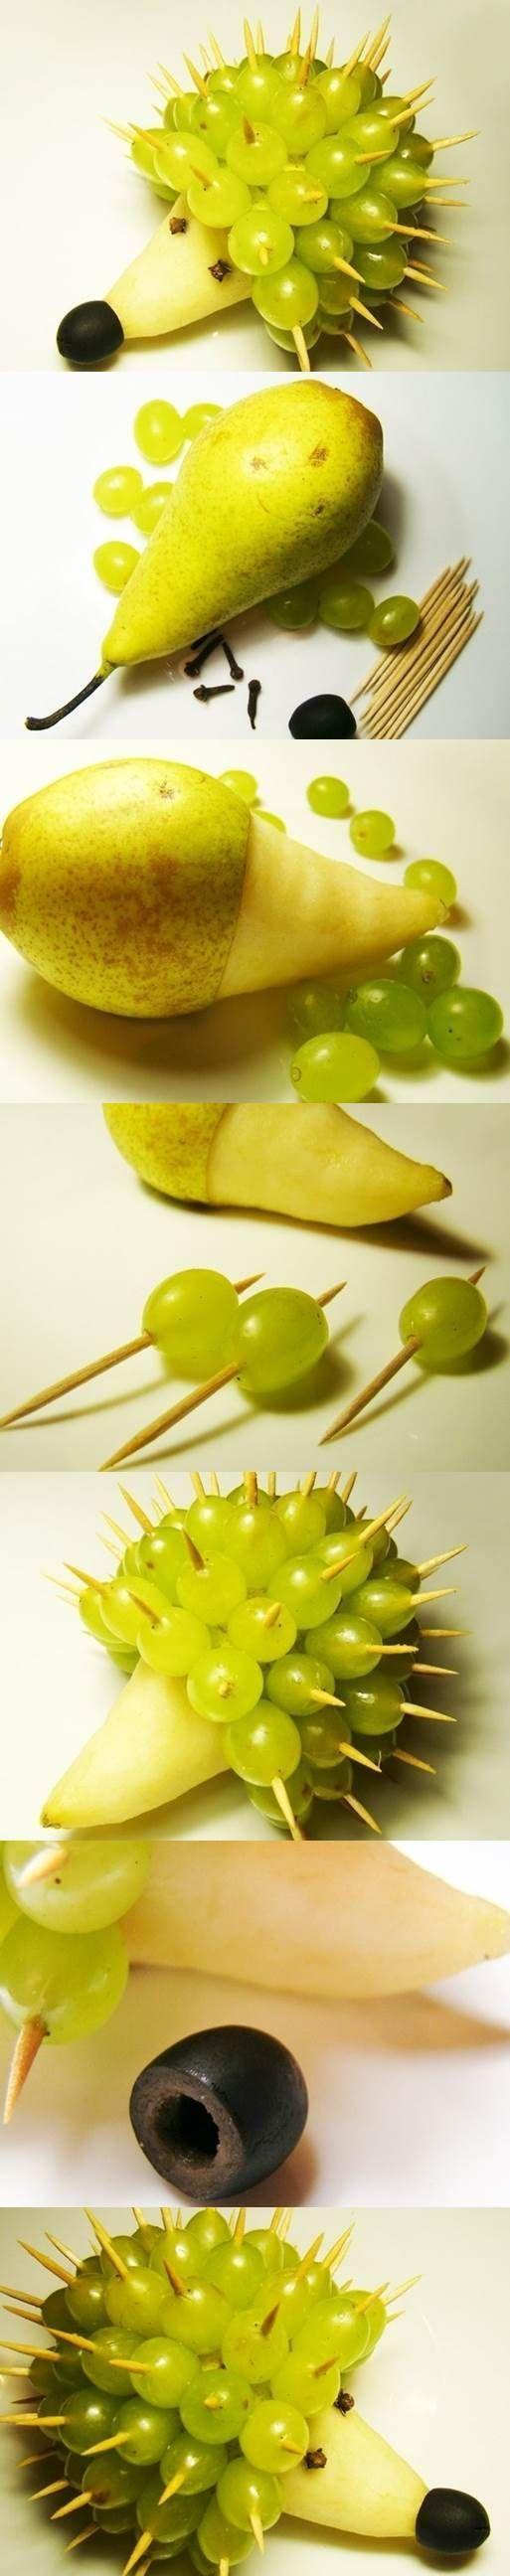 Food Art Bricolage - Hérisson